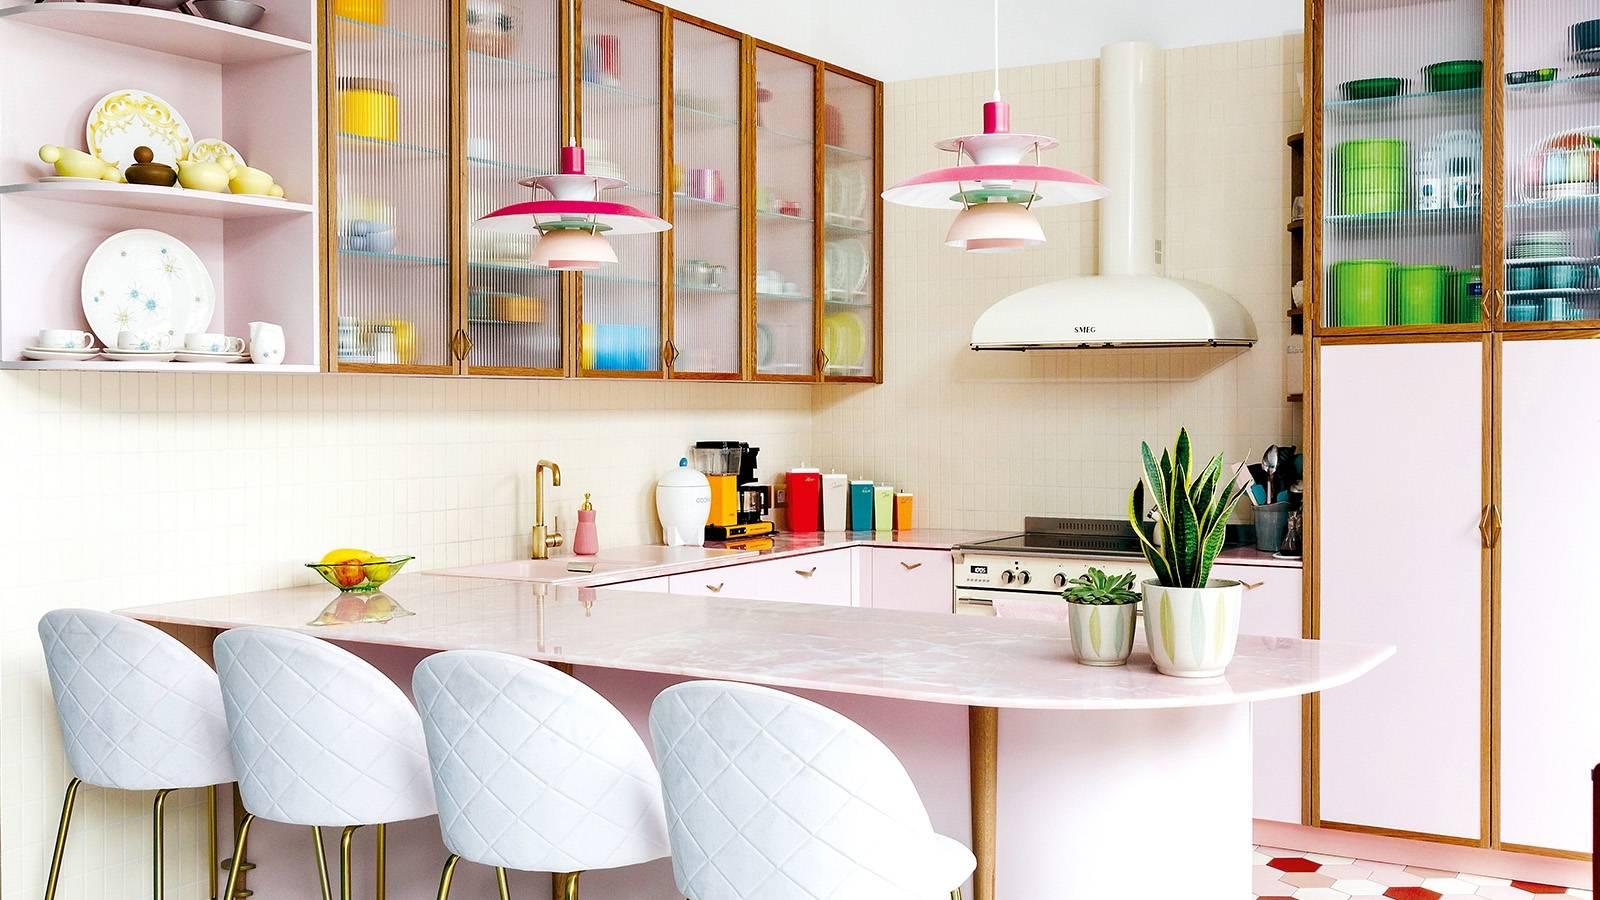 Expat Kiwi's technicolour loft Amsterdam apartment